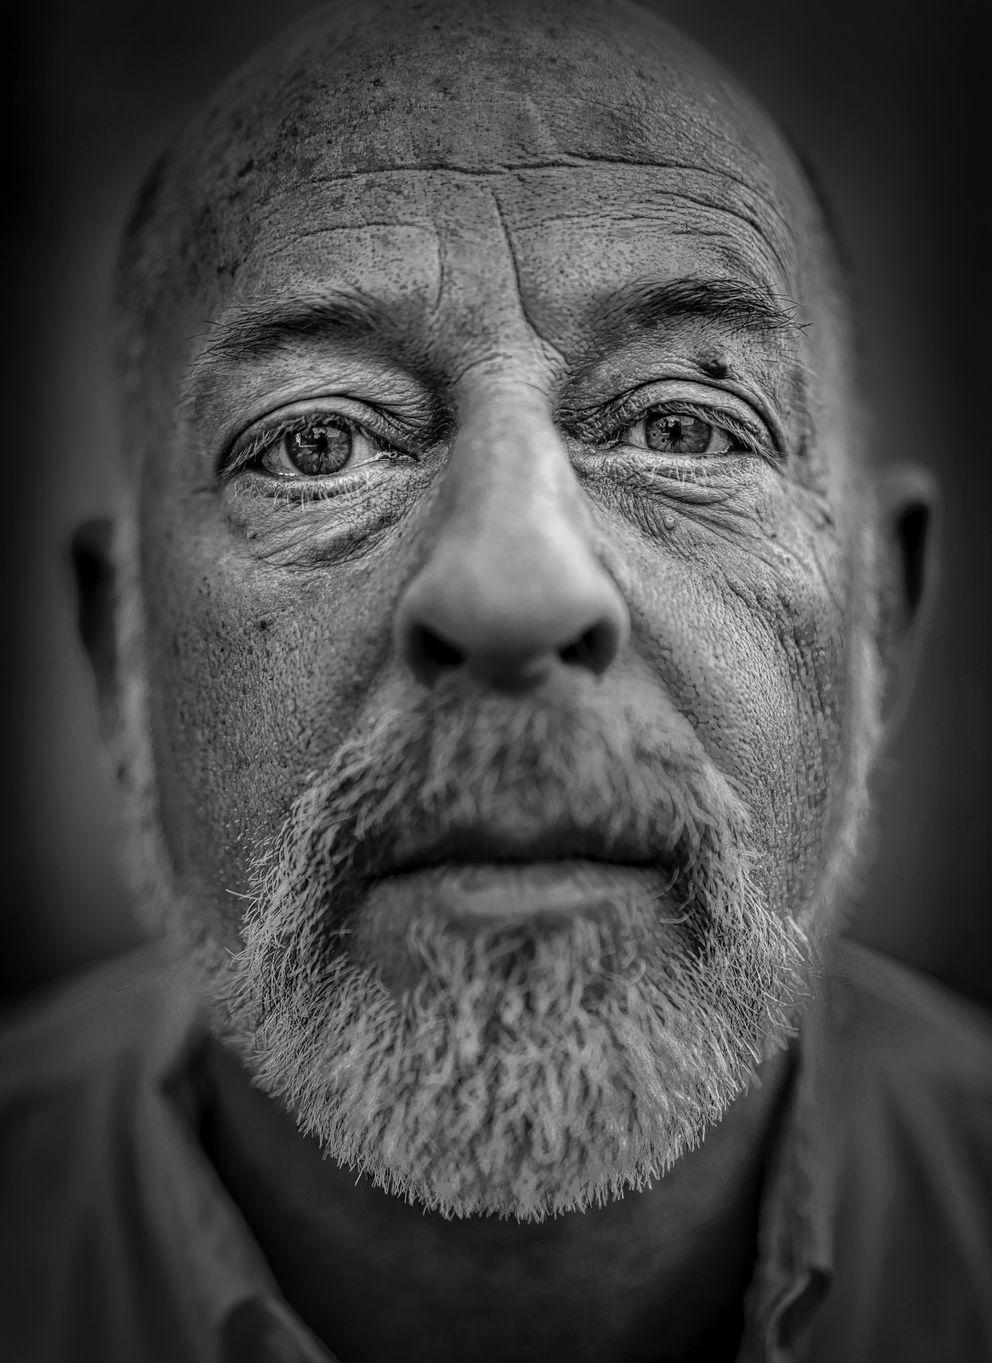 Jerry Joseph (Photo by Michael Schoenfeld)